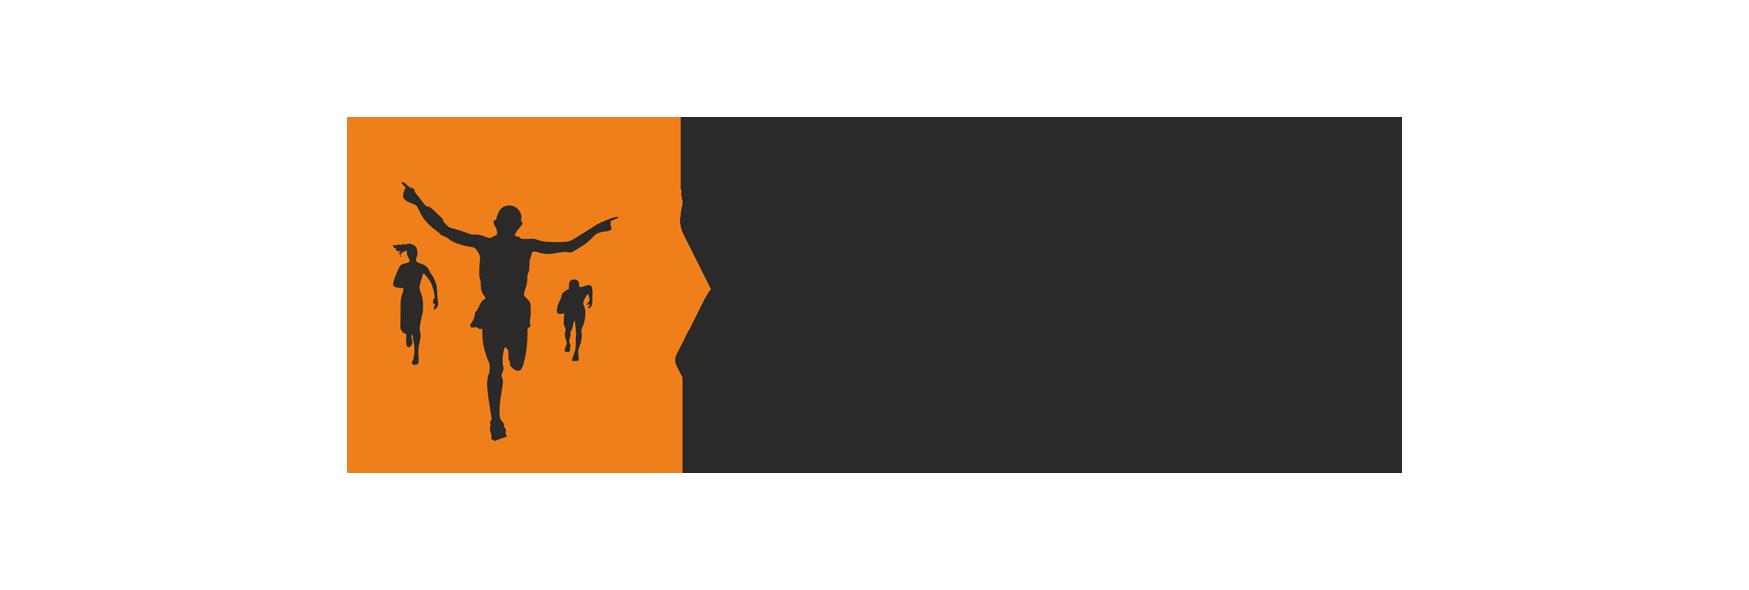 Sport-life124